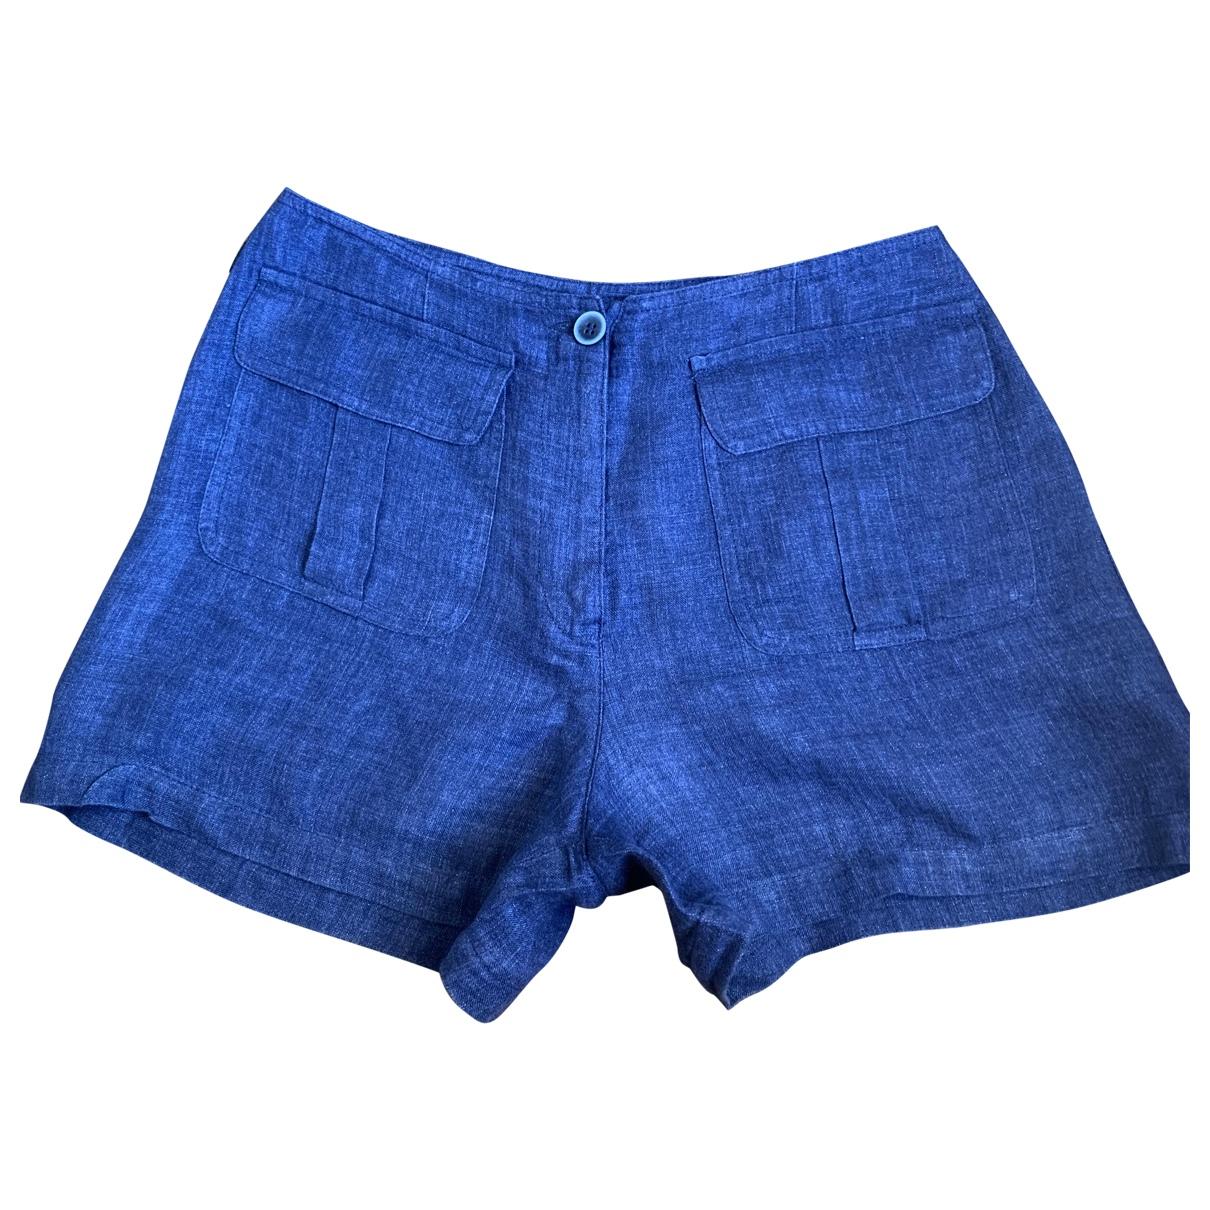 Armani Jeans \N Shorts in  Blau Baumwolle